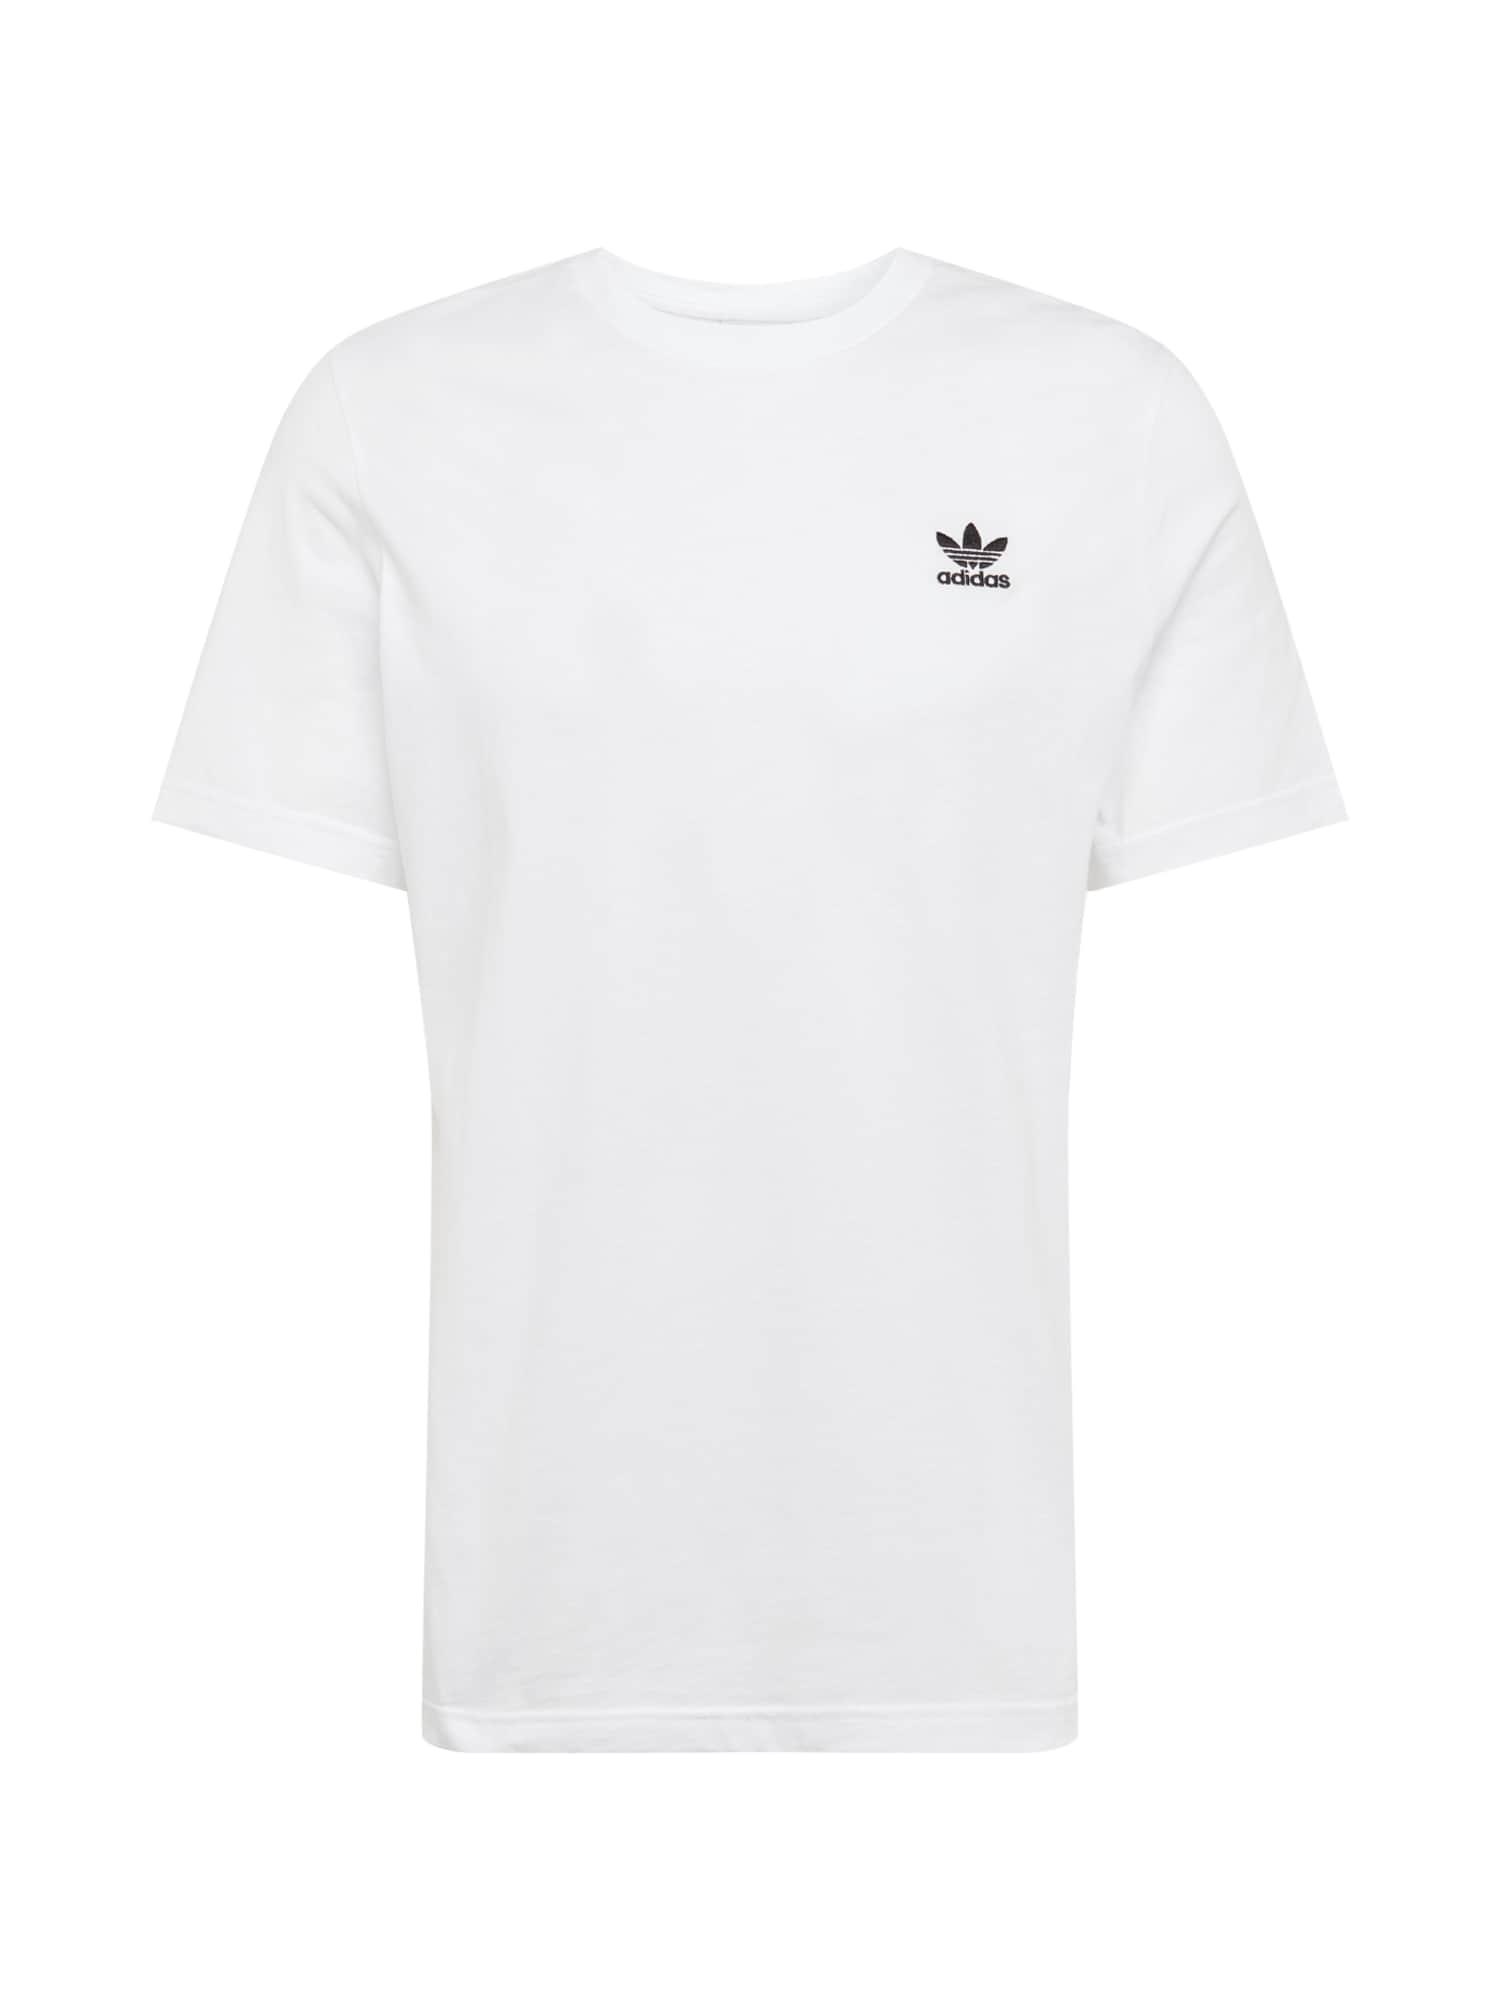 ADIDAS ORIGINALS Marškinėliai 'ESSENTIAL TEE' balta